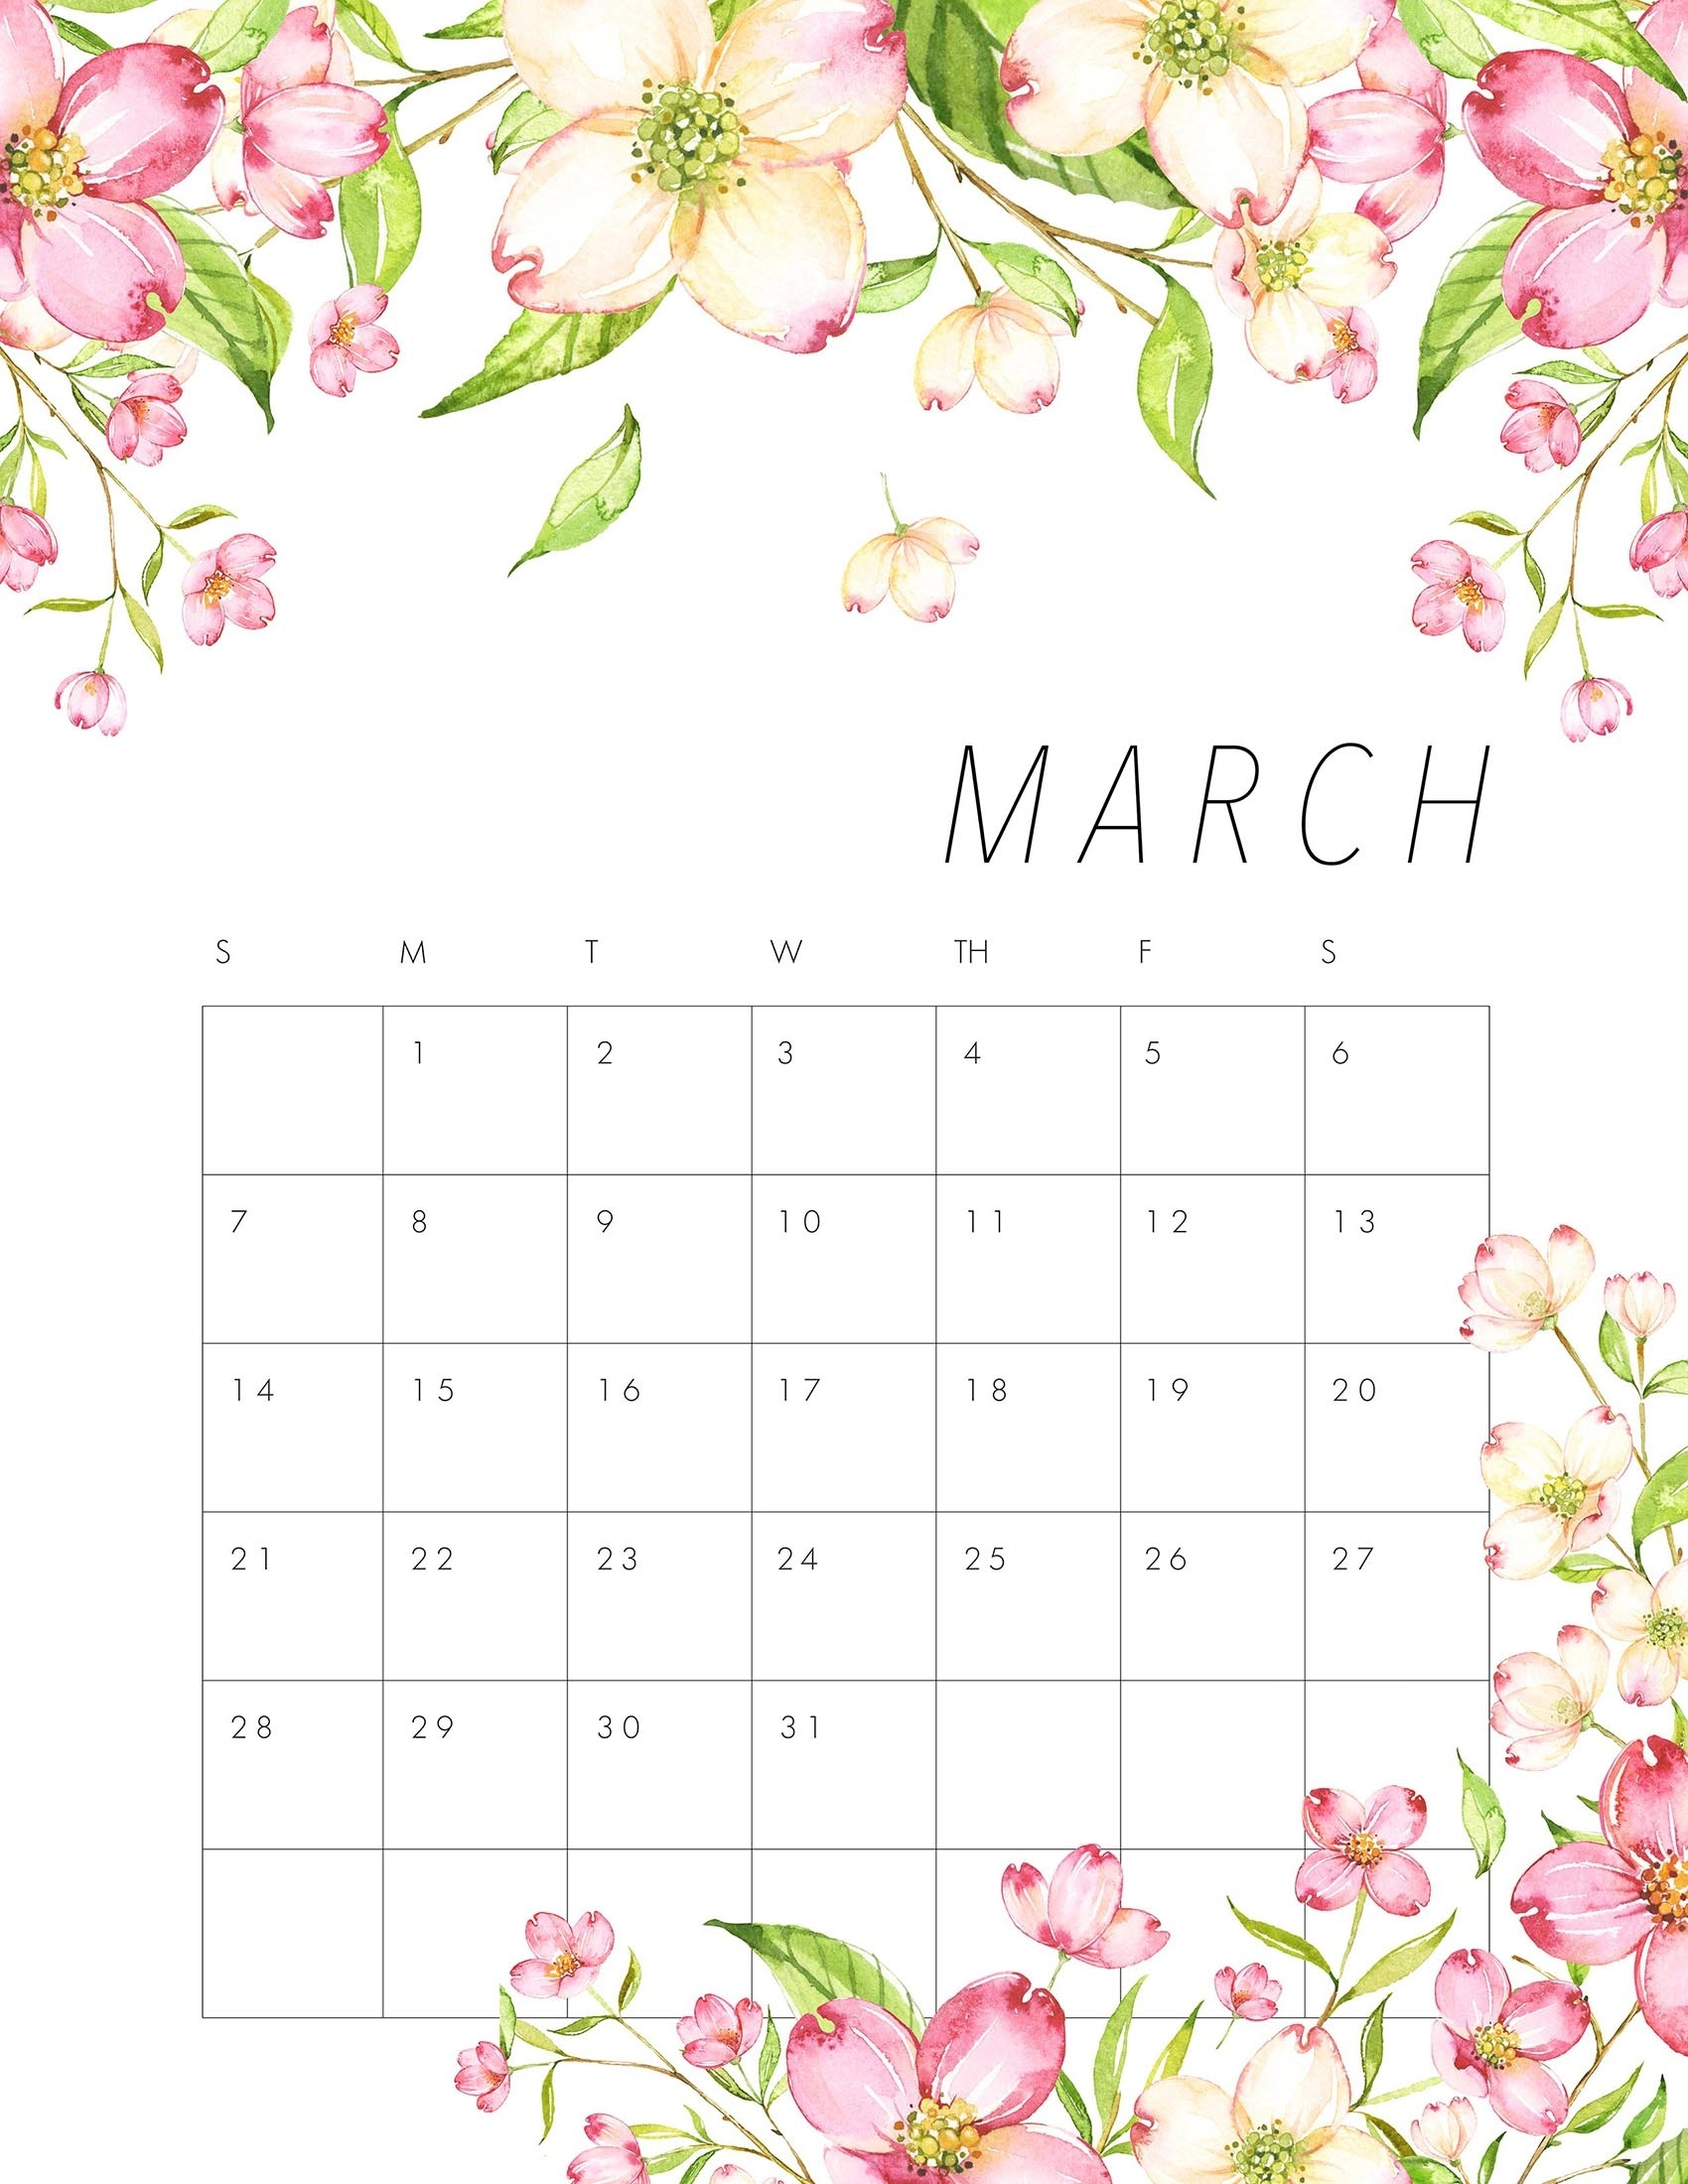 Free Printable 2021 Floral Calendar - The Cottage Market August 2021 Calendar Floral